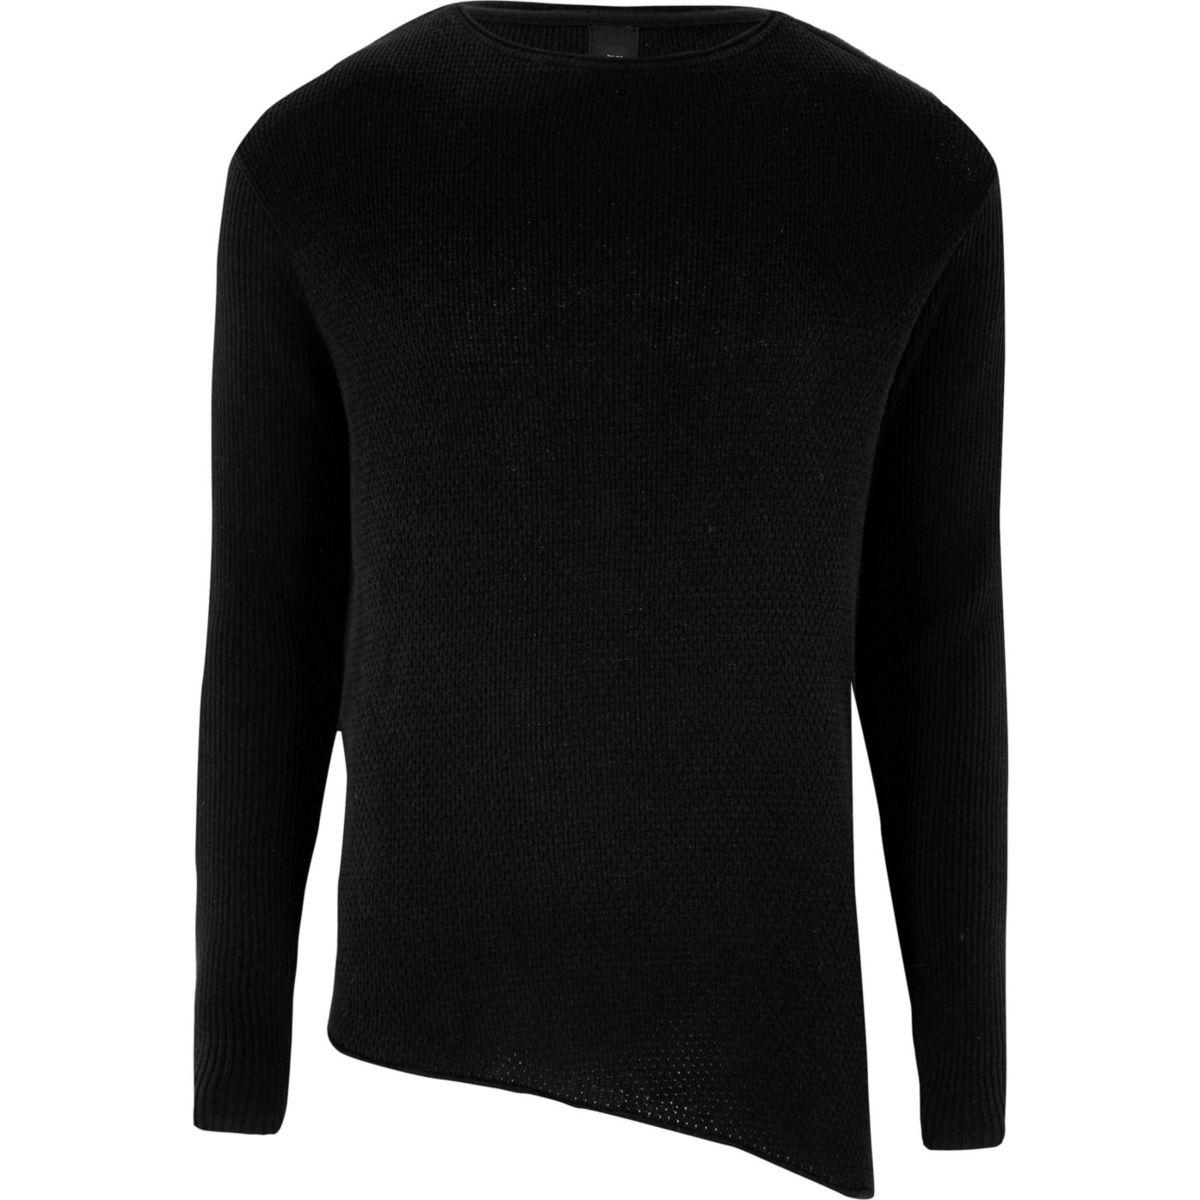 Black asymmetric hem muscle fit knit jumper